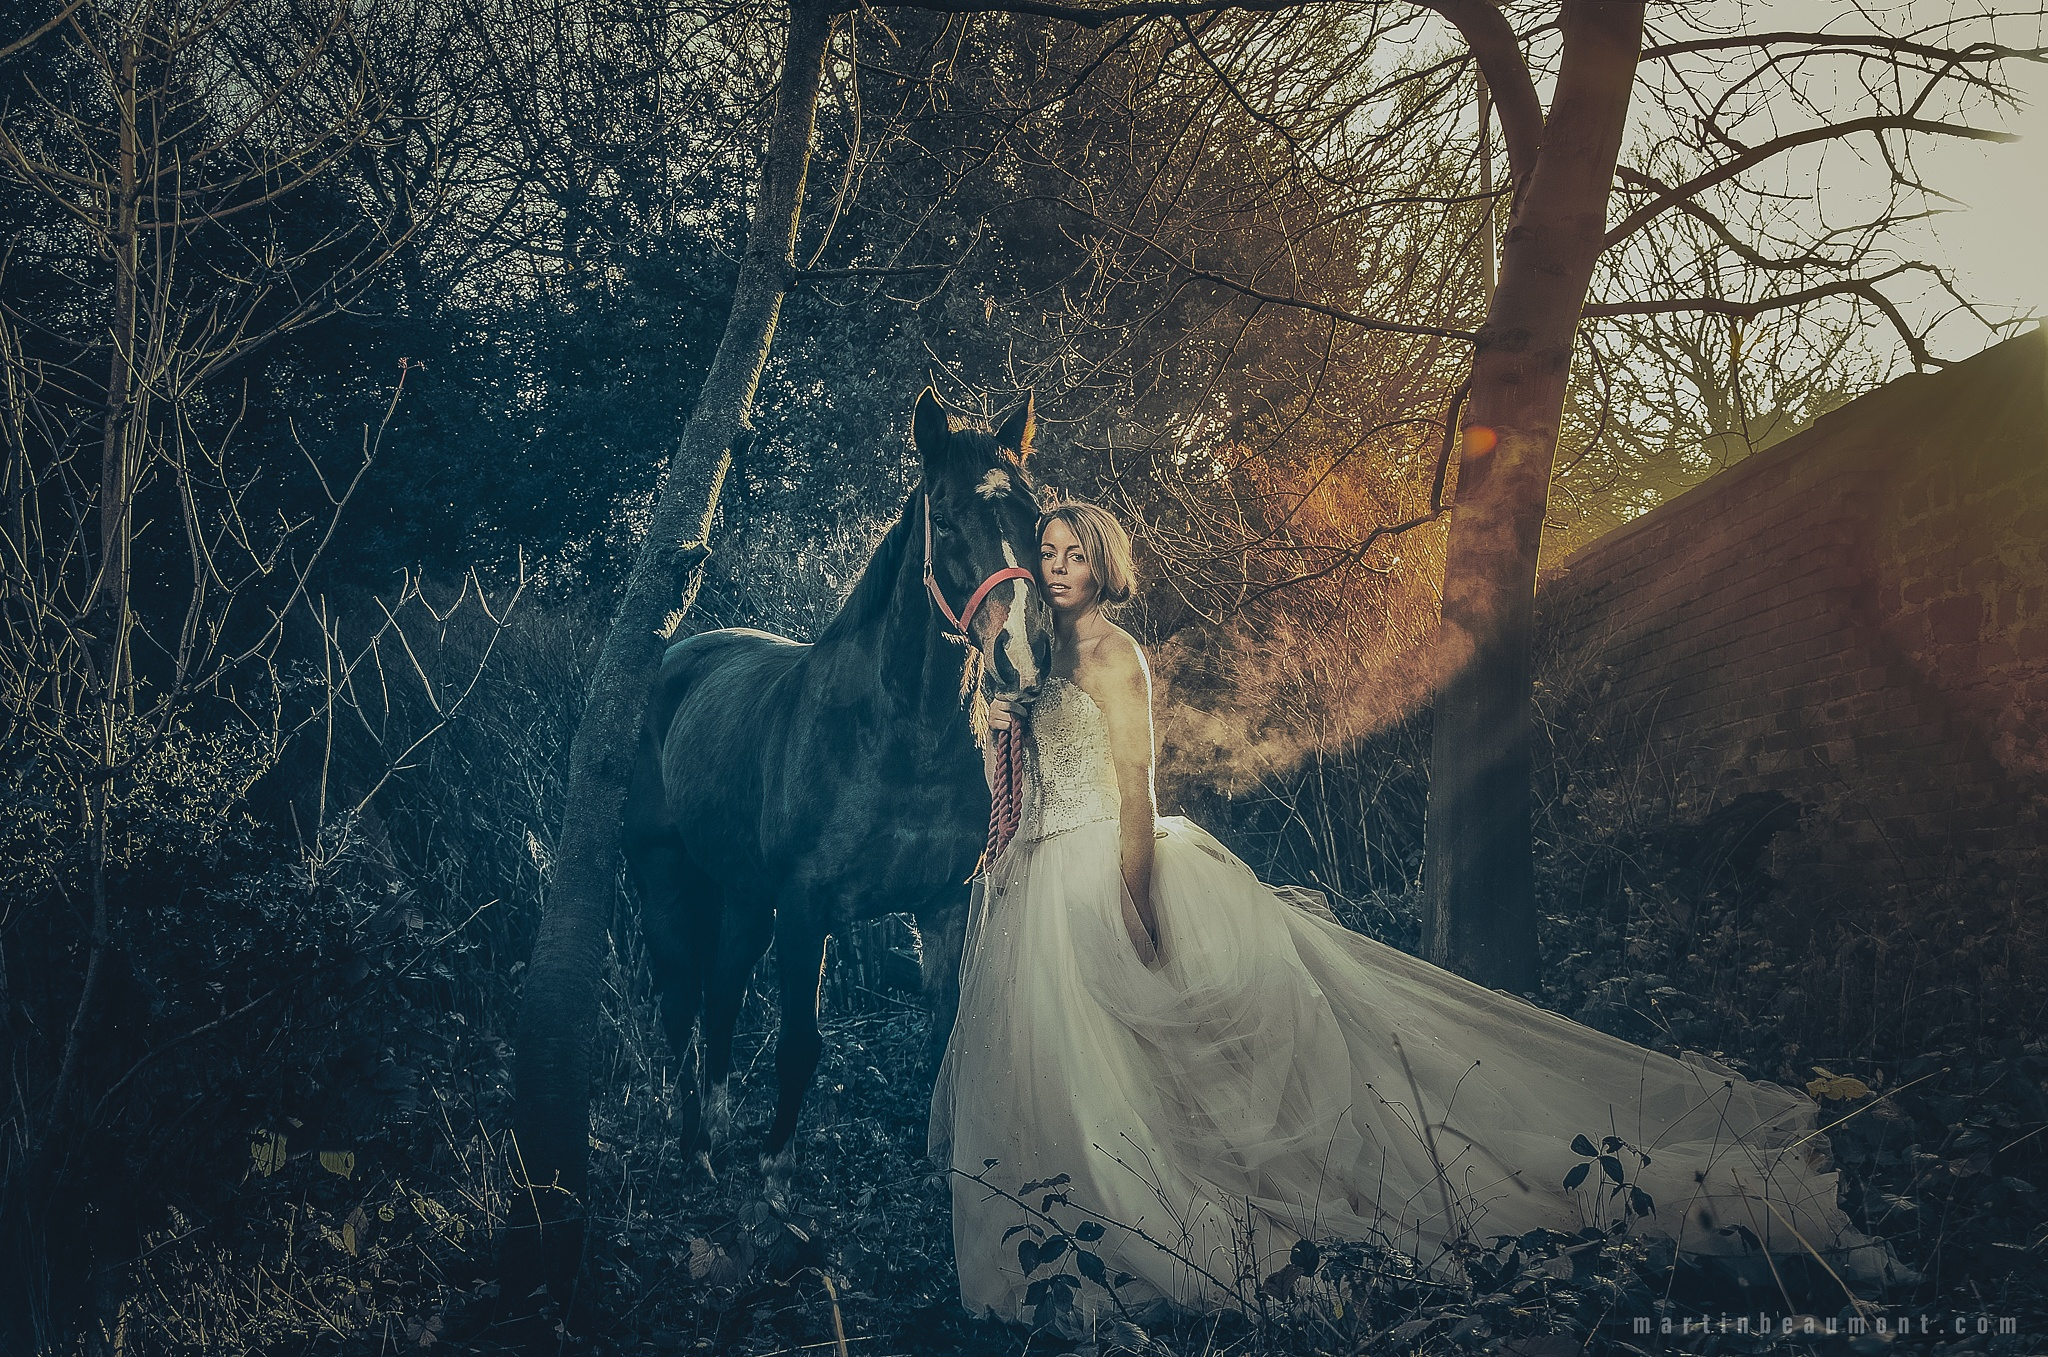 Bridal Portrait by MartinBeaumont